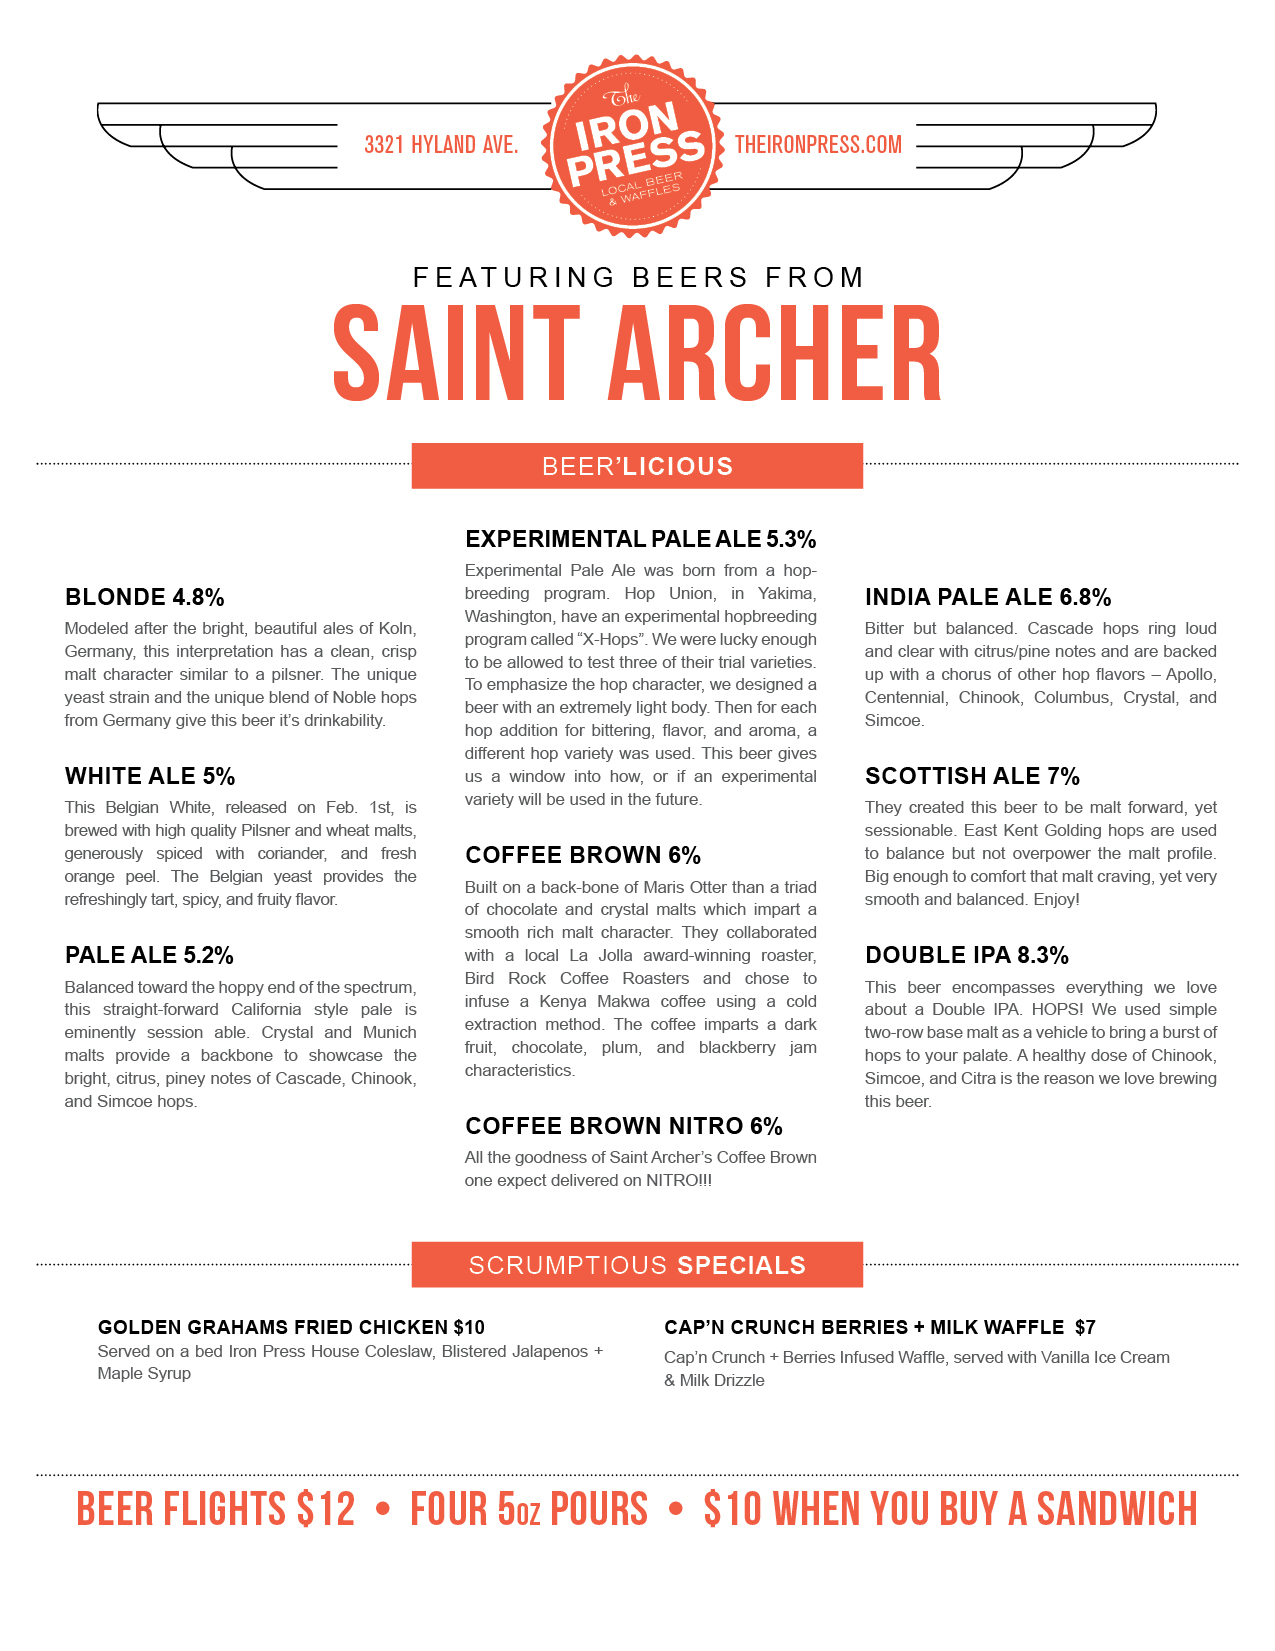 Saint Archer Brewing x The Iron Press